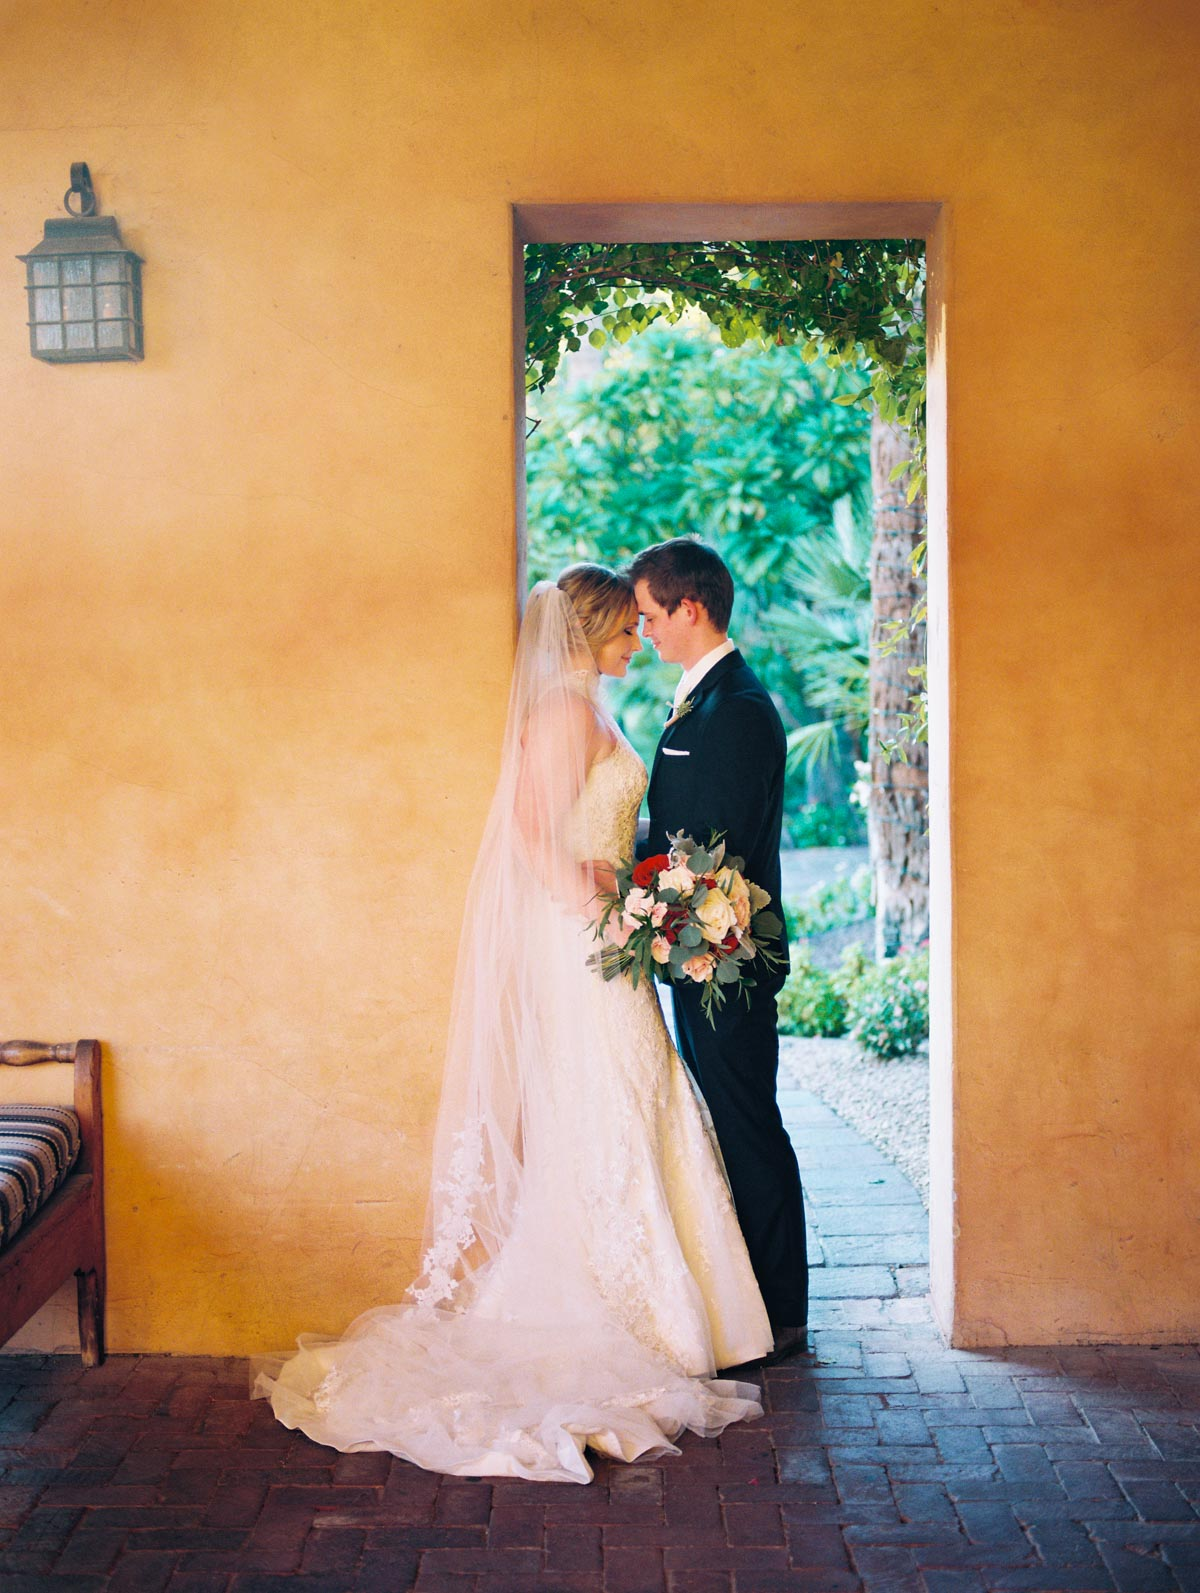 royal-palms-wedding-photographer-7.jpg